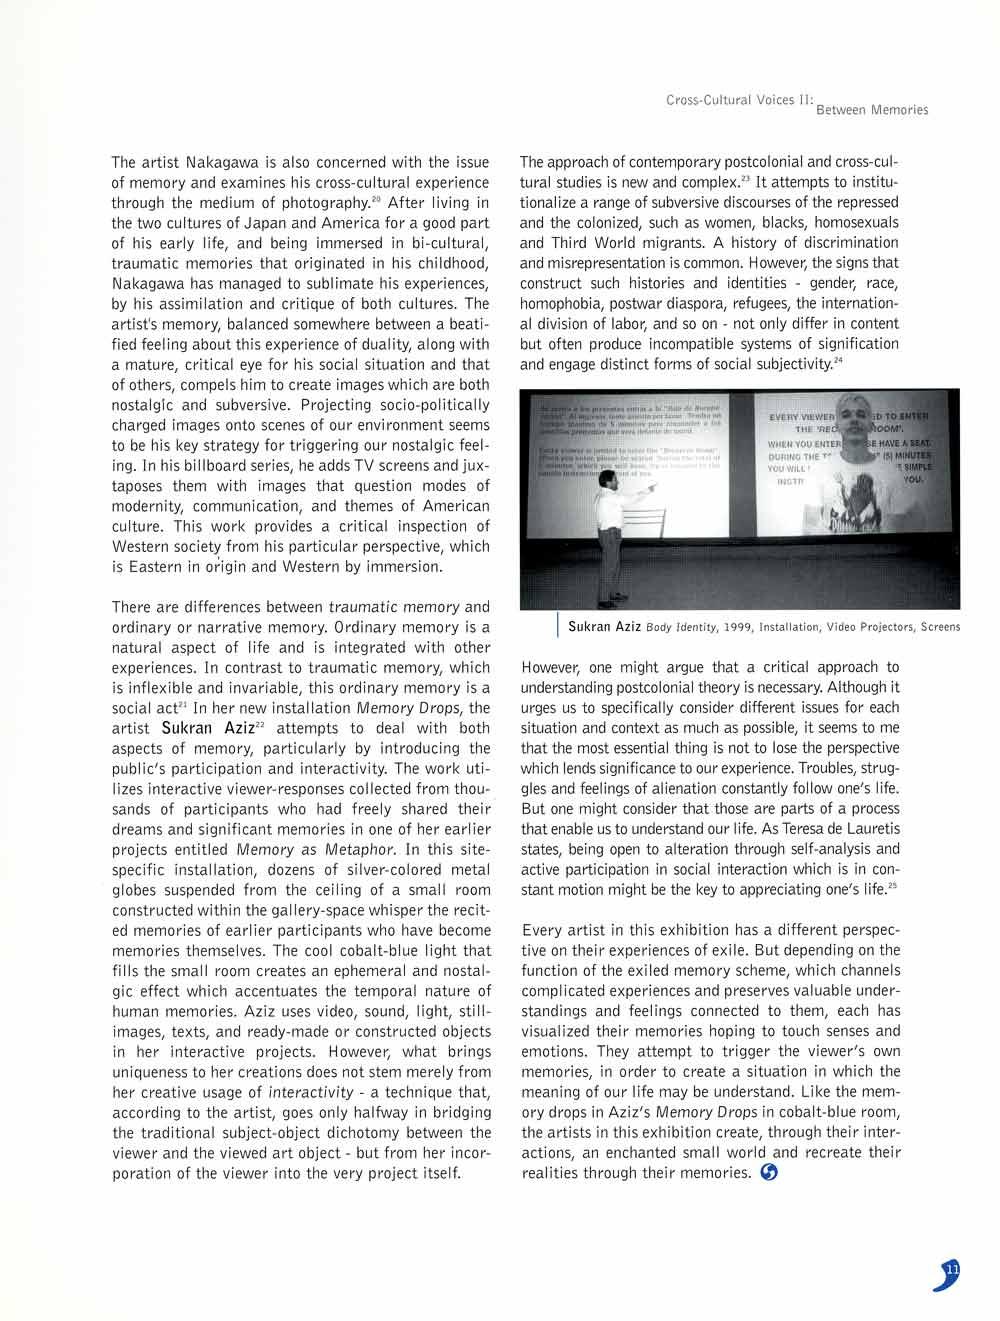 Cross-Cultural Voices II, exhibition catalog, pg 8